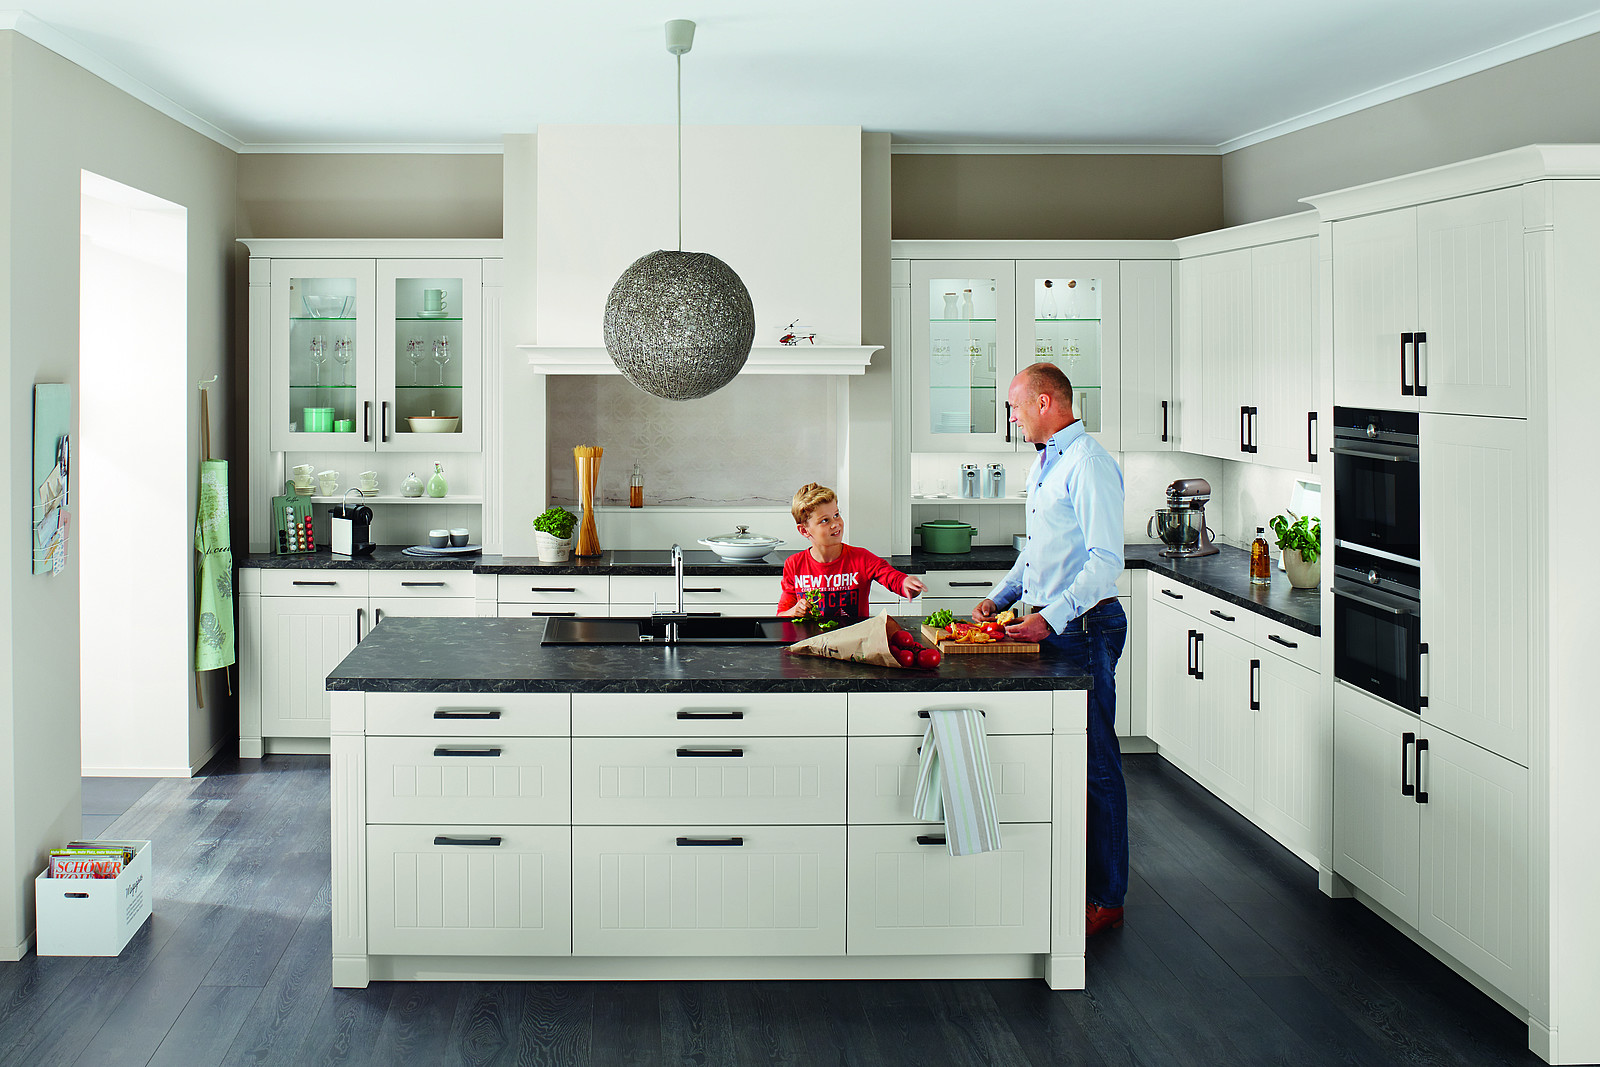 Full Size of Küche Mit Elektrogeräten 200 Cm Küche Mit Elektrogeräten Preis Küche Mit Elektrogeräten Billig Küche Mit Elektrogeräten Finanzierung Küche Eckküche Mit Elektrogeräten